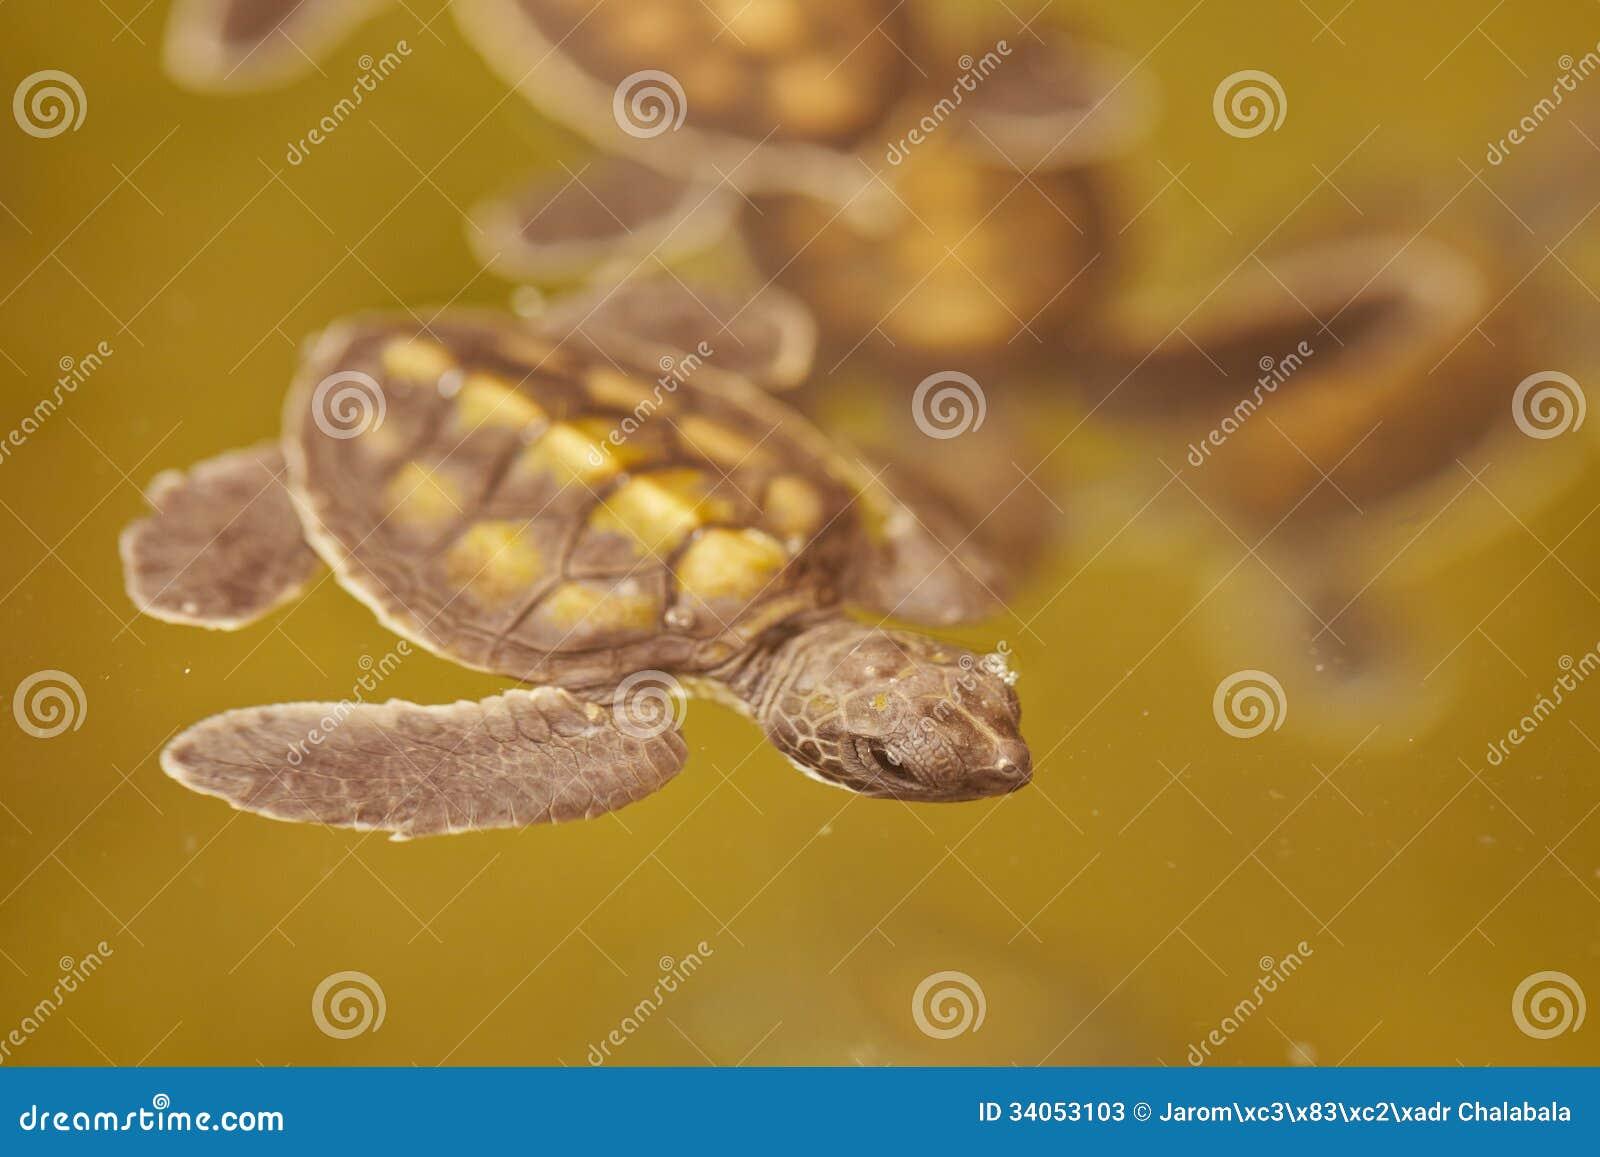 Baby turtle stock image. Image of basin, trough, turtle - 34053103